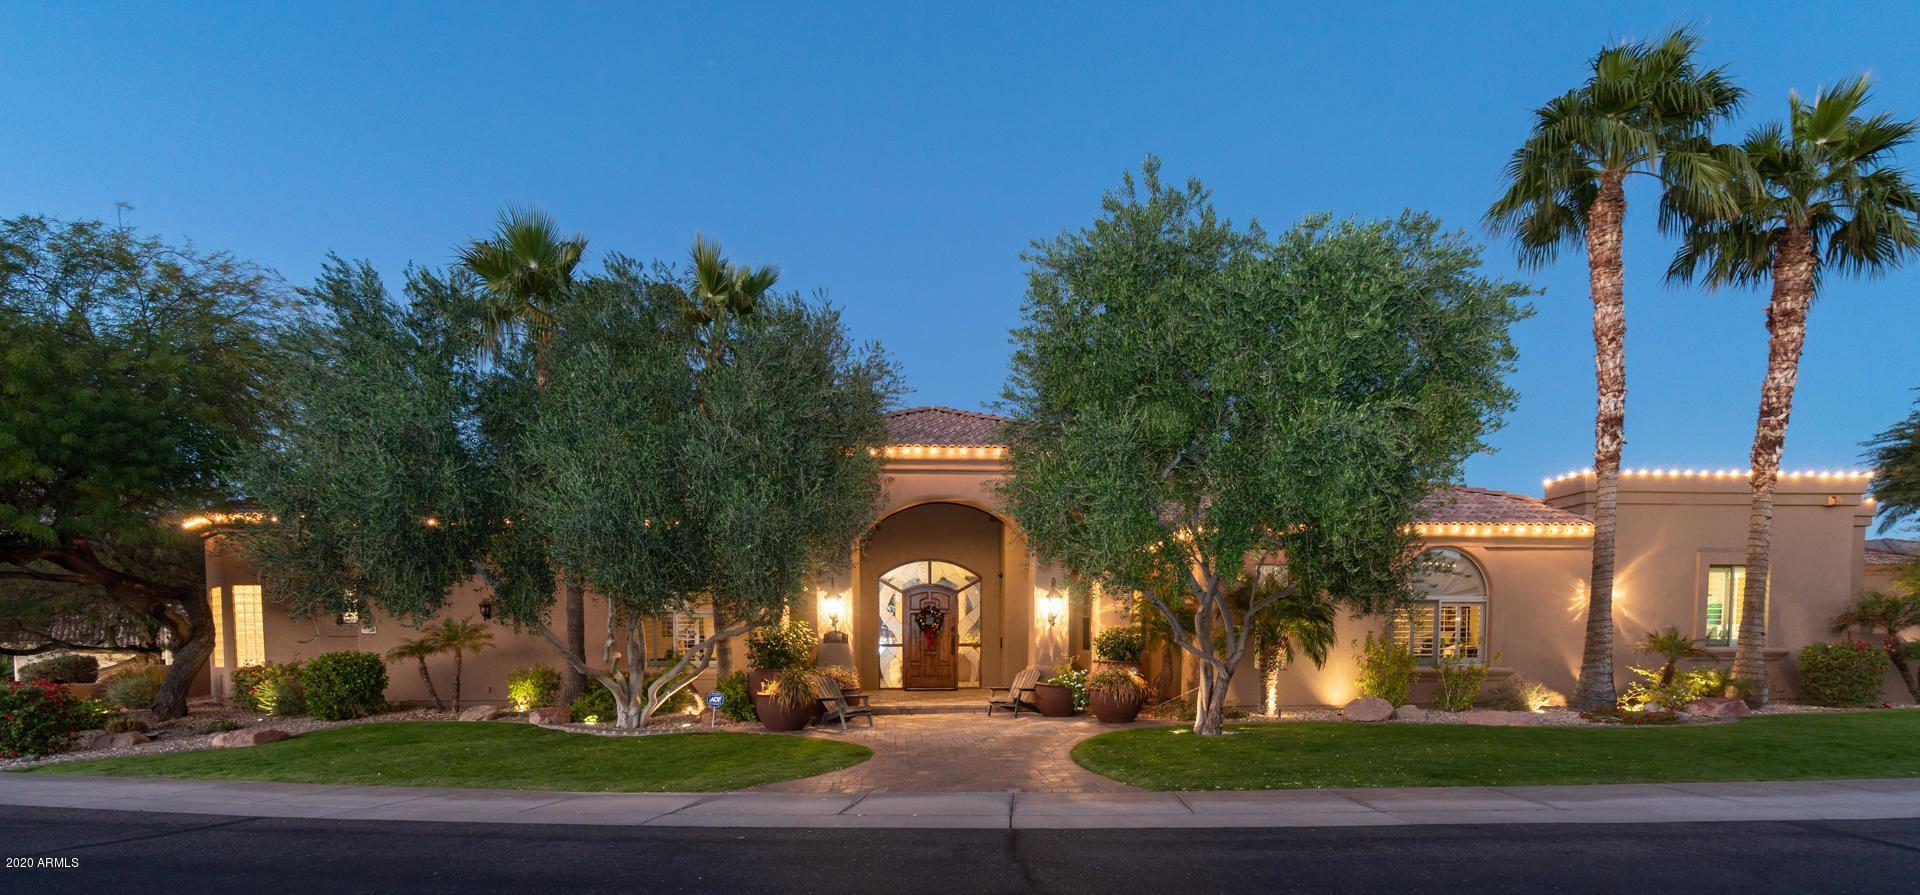 15801 S 7th Street, Phoenix, AZ 85048 - MLS#: 6167004